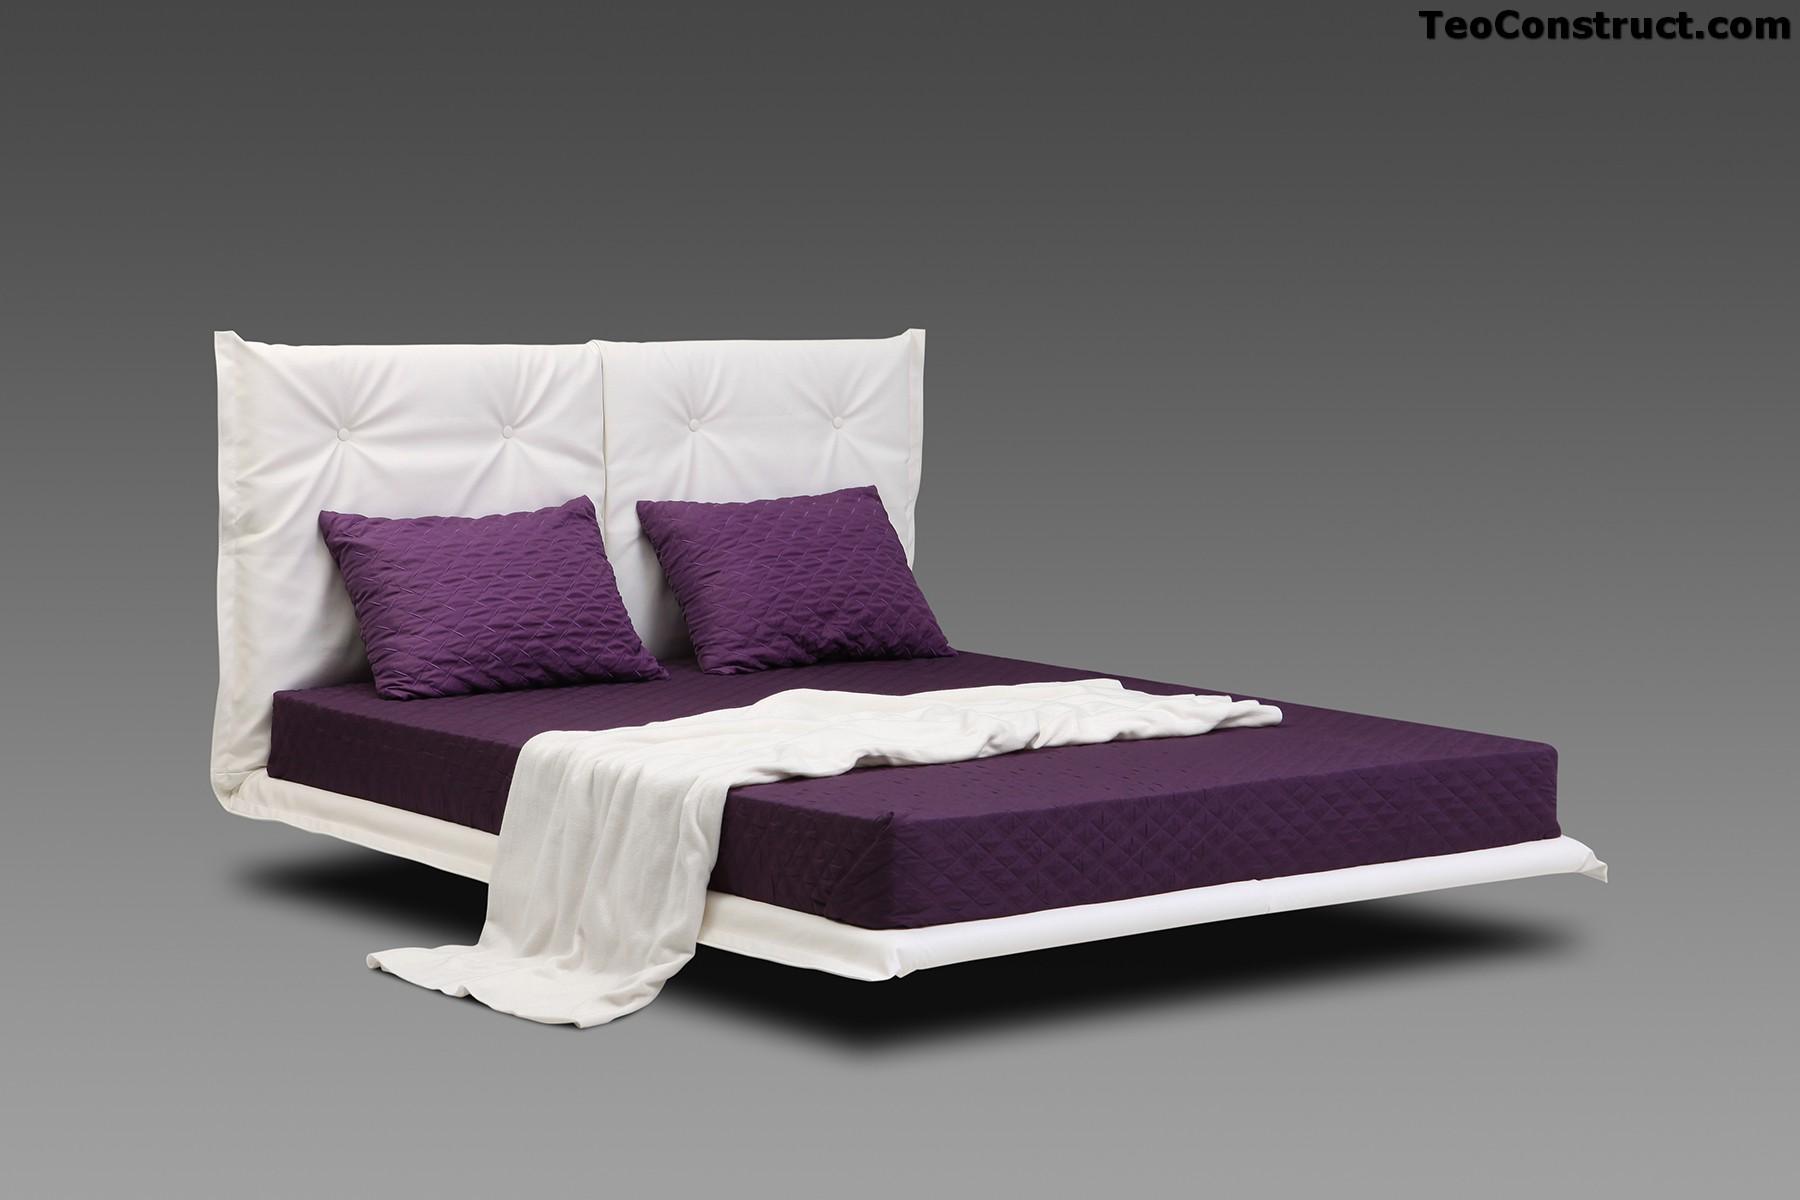 Set dormitor Bella de calitate superioara05